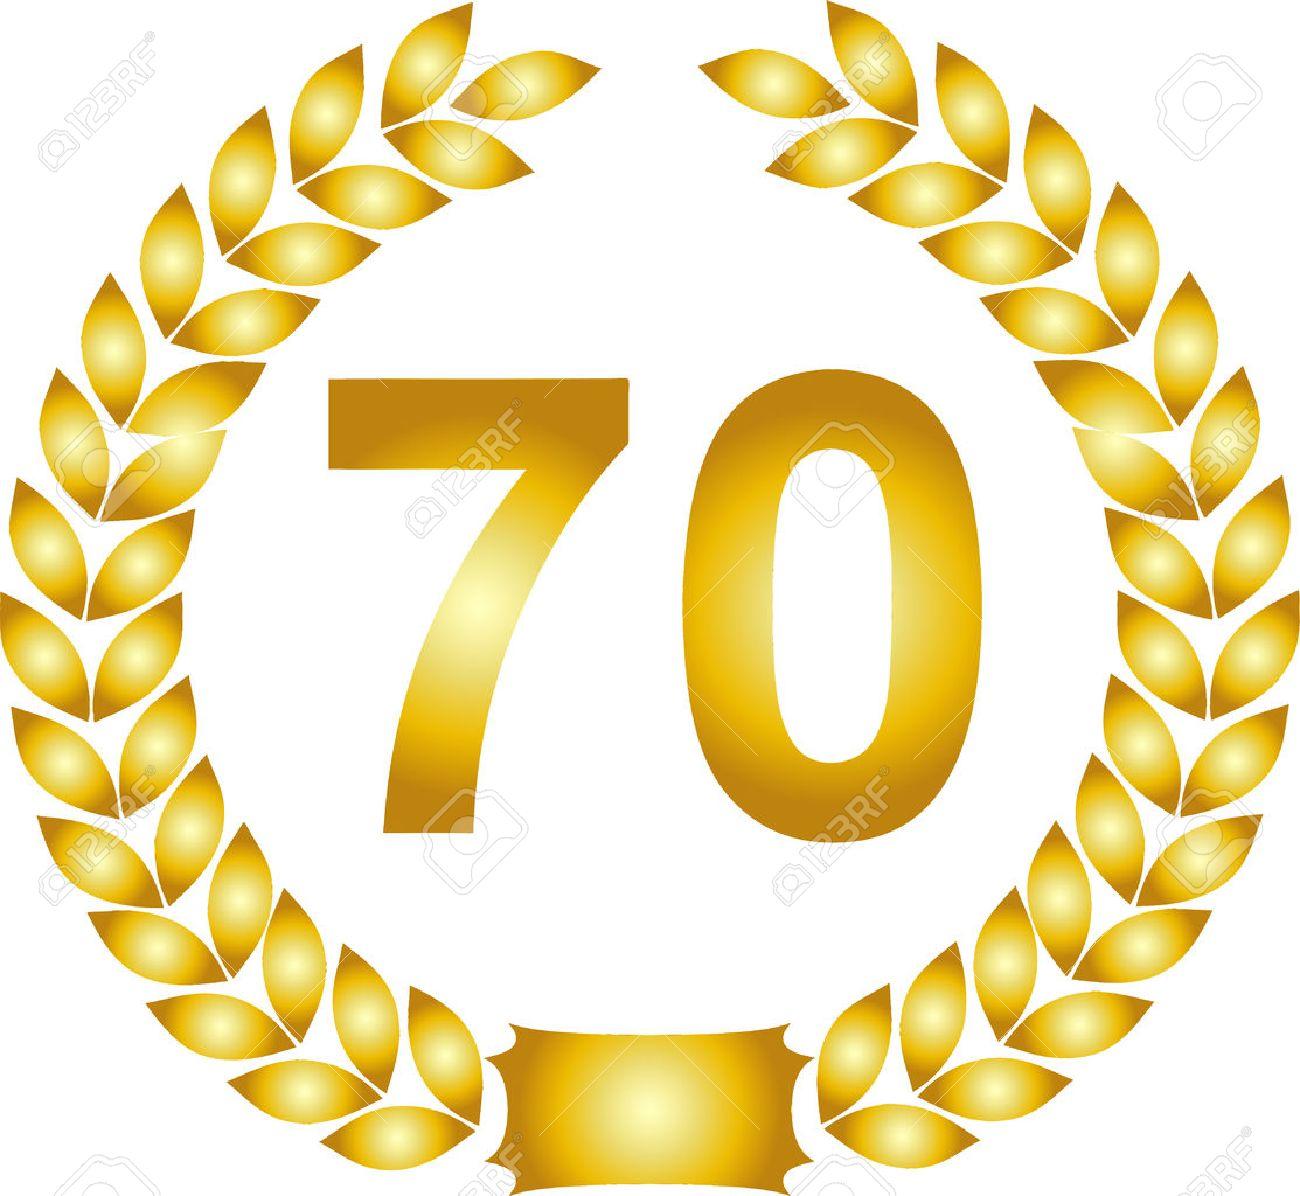 70-LECIE